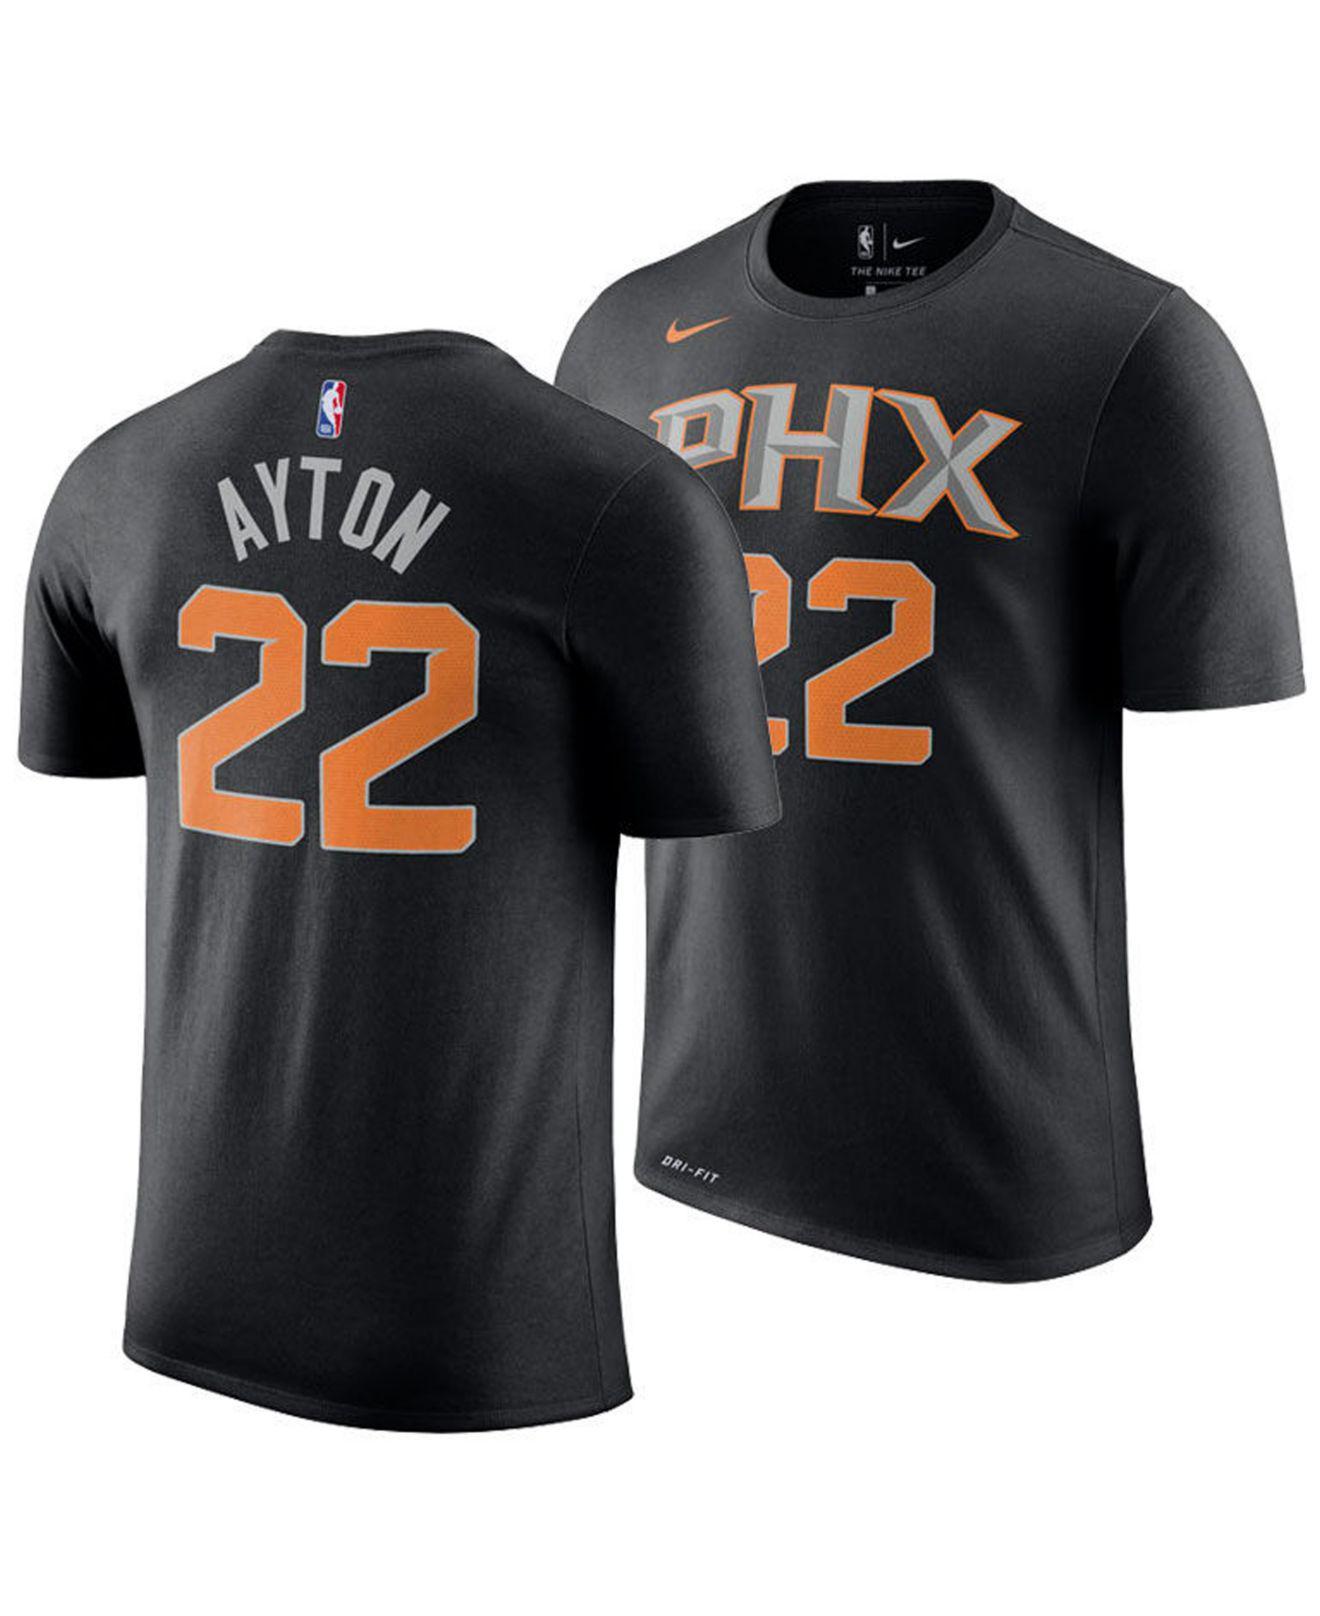 f9db37f25165 Nike - Black Deandre Ayton Phoenix Suns Nba Statement Player T-shirt for  Men -. View fullscreen